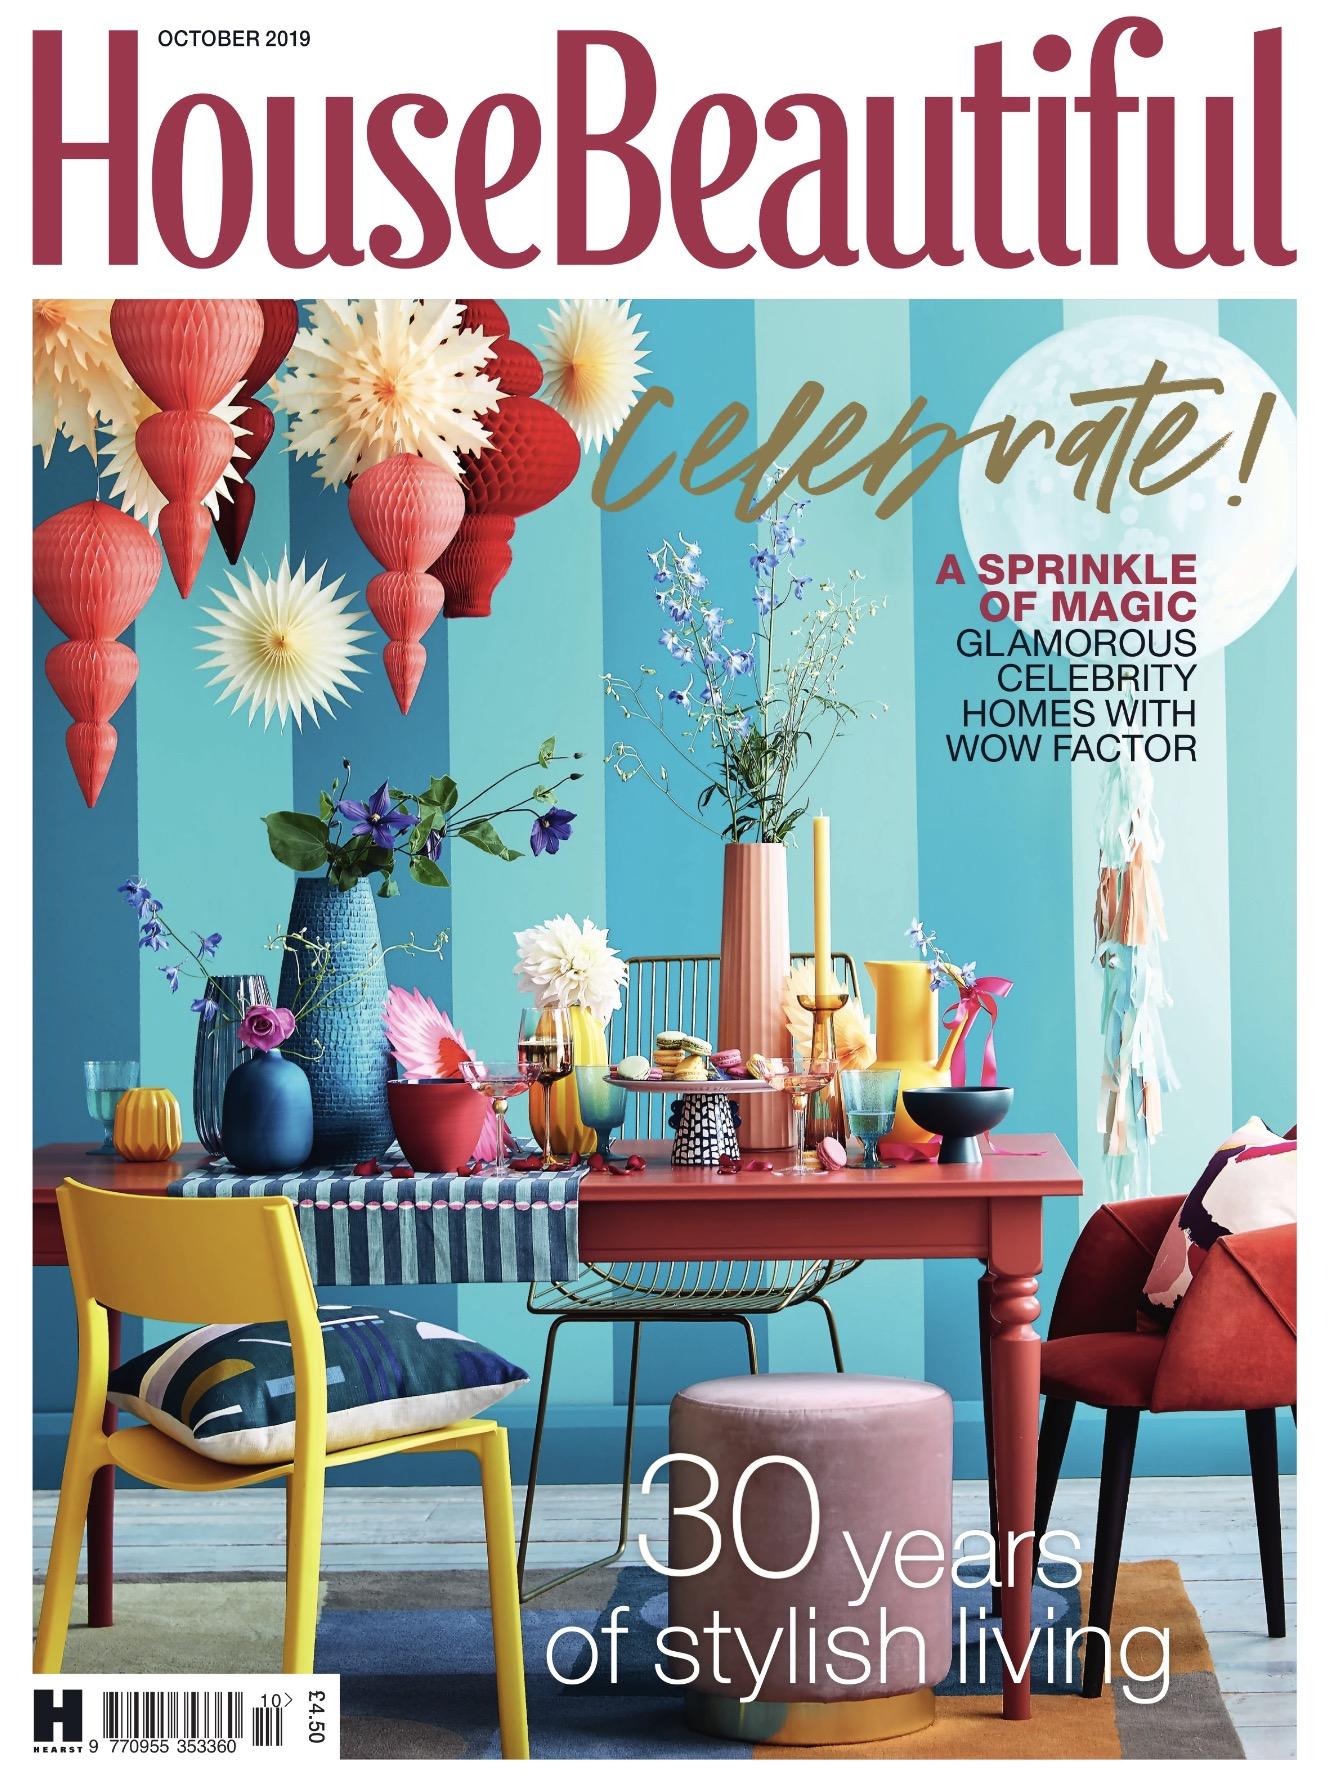 House Beautiful October 2019 Cover.jpg